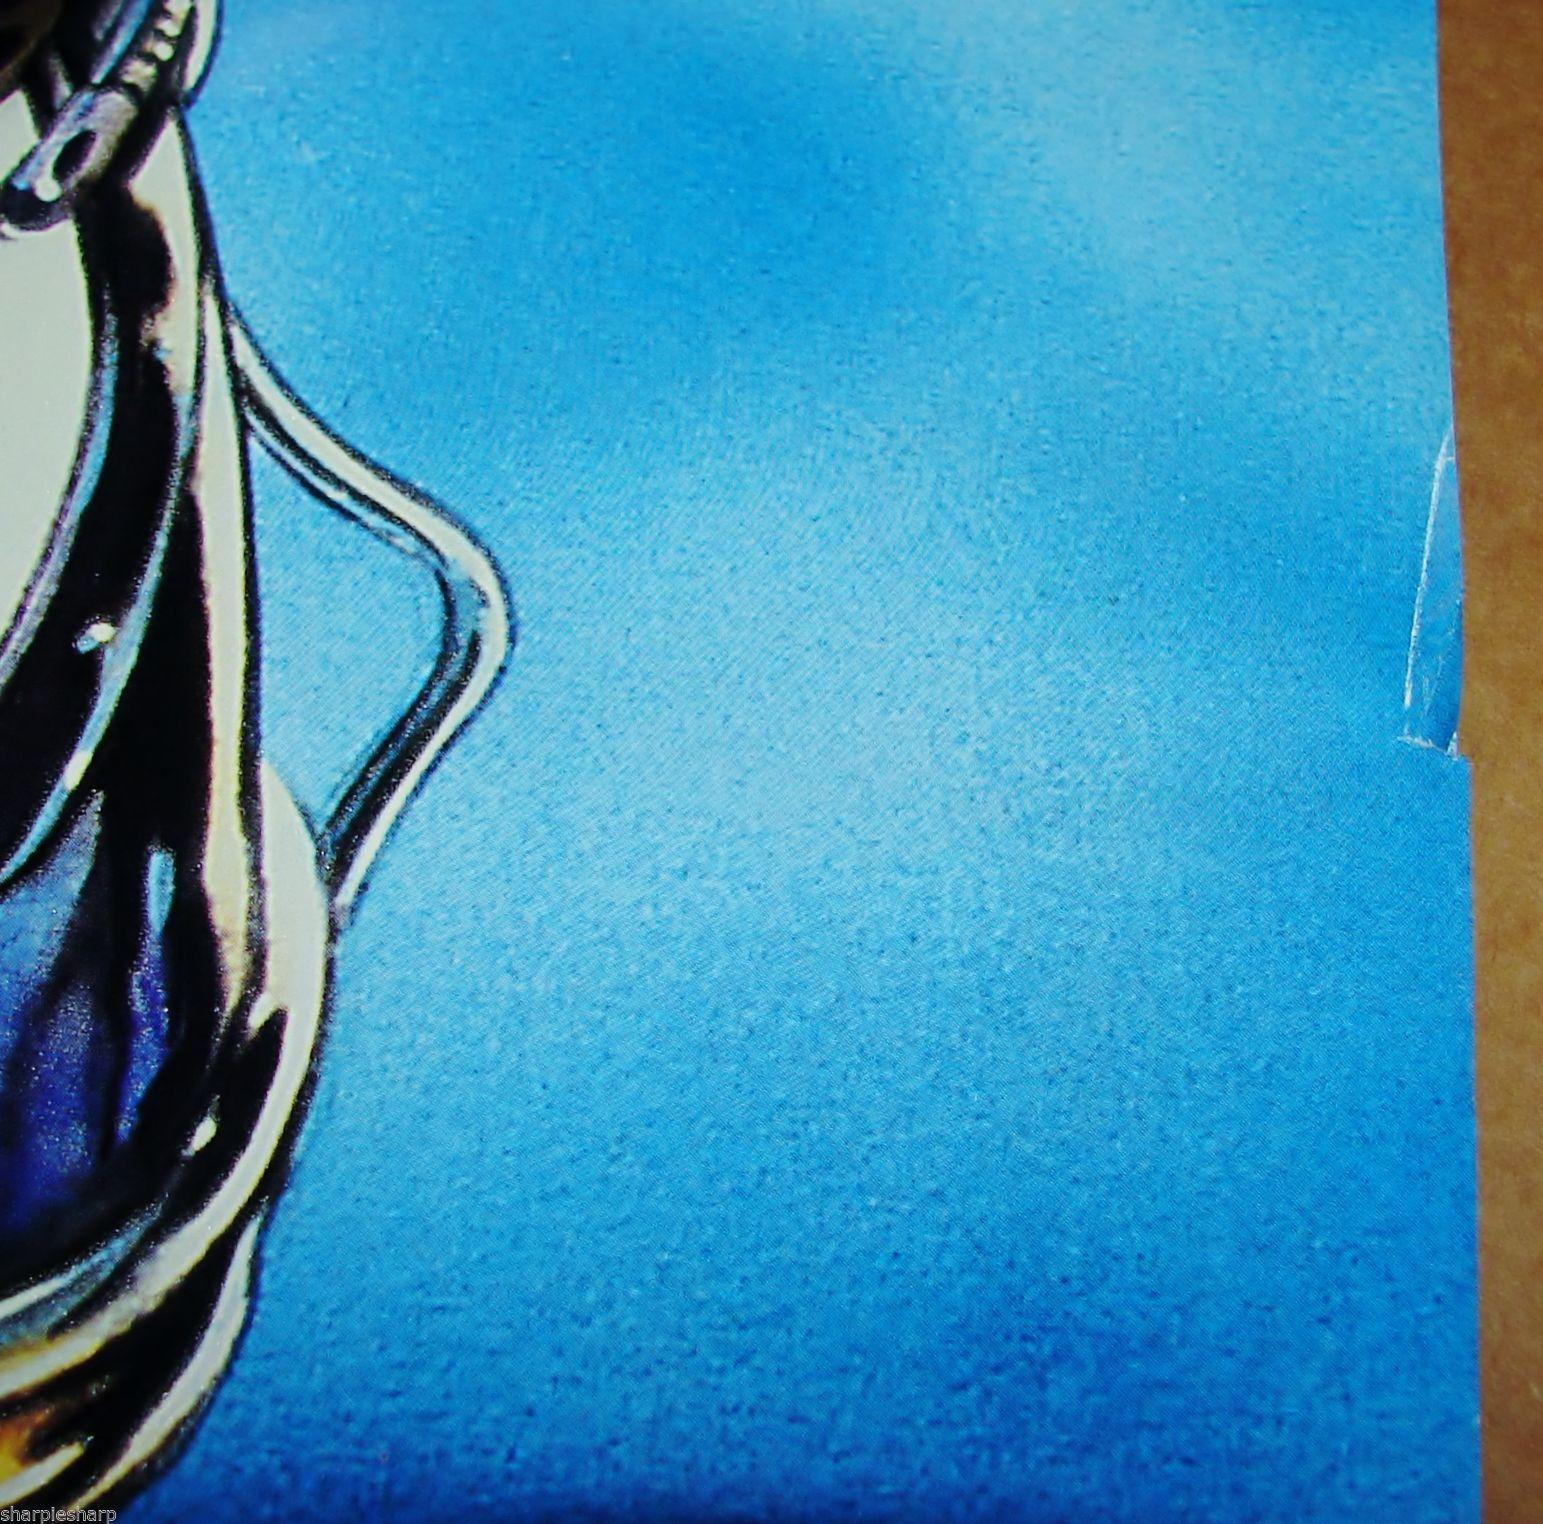 "1997 BATMAN & ROBIN Movie MR. FREEZE GLOW IN THE DARK POSTER 23x34.5"" 30-007 1"